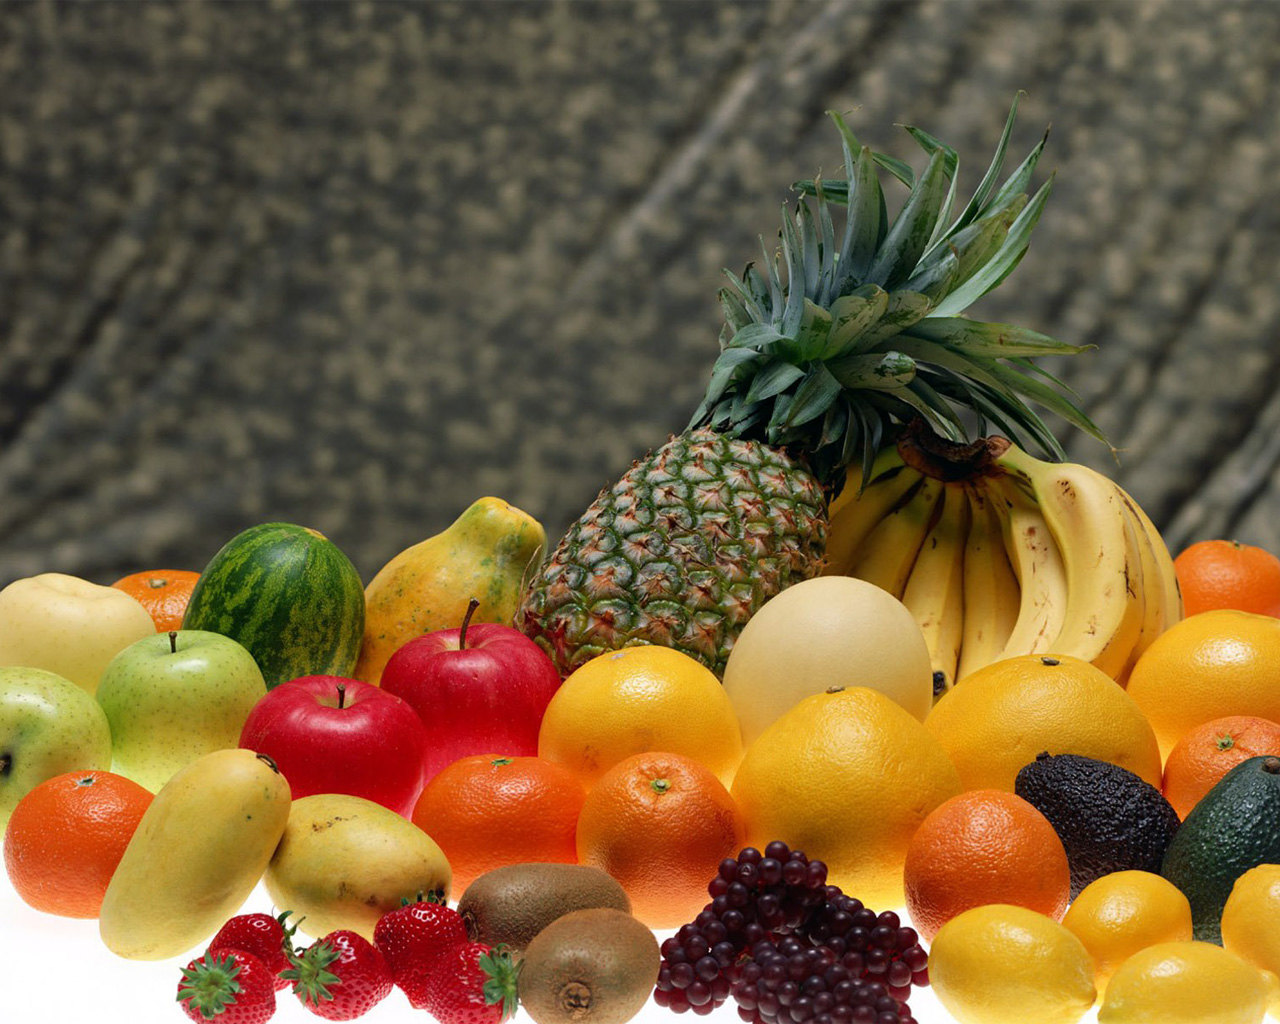 http://4.bp.blogspot.com/-__pgMQ2JDzQ/TZQjcCBPRMI/AAAAAAAAAAY/AEQCuzDYC7A/s1600/fruits-wallpaper-.jpg